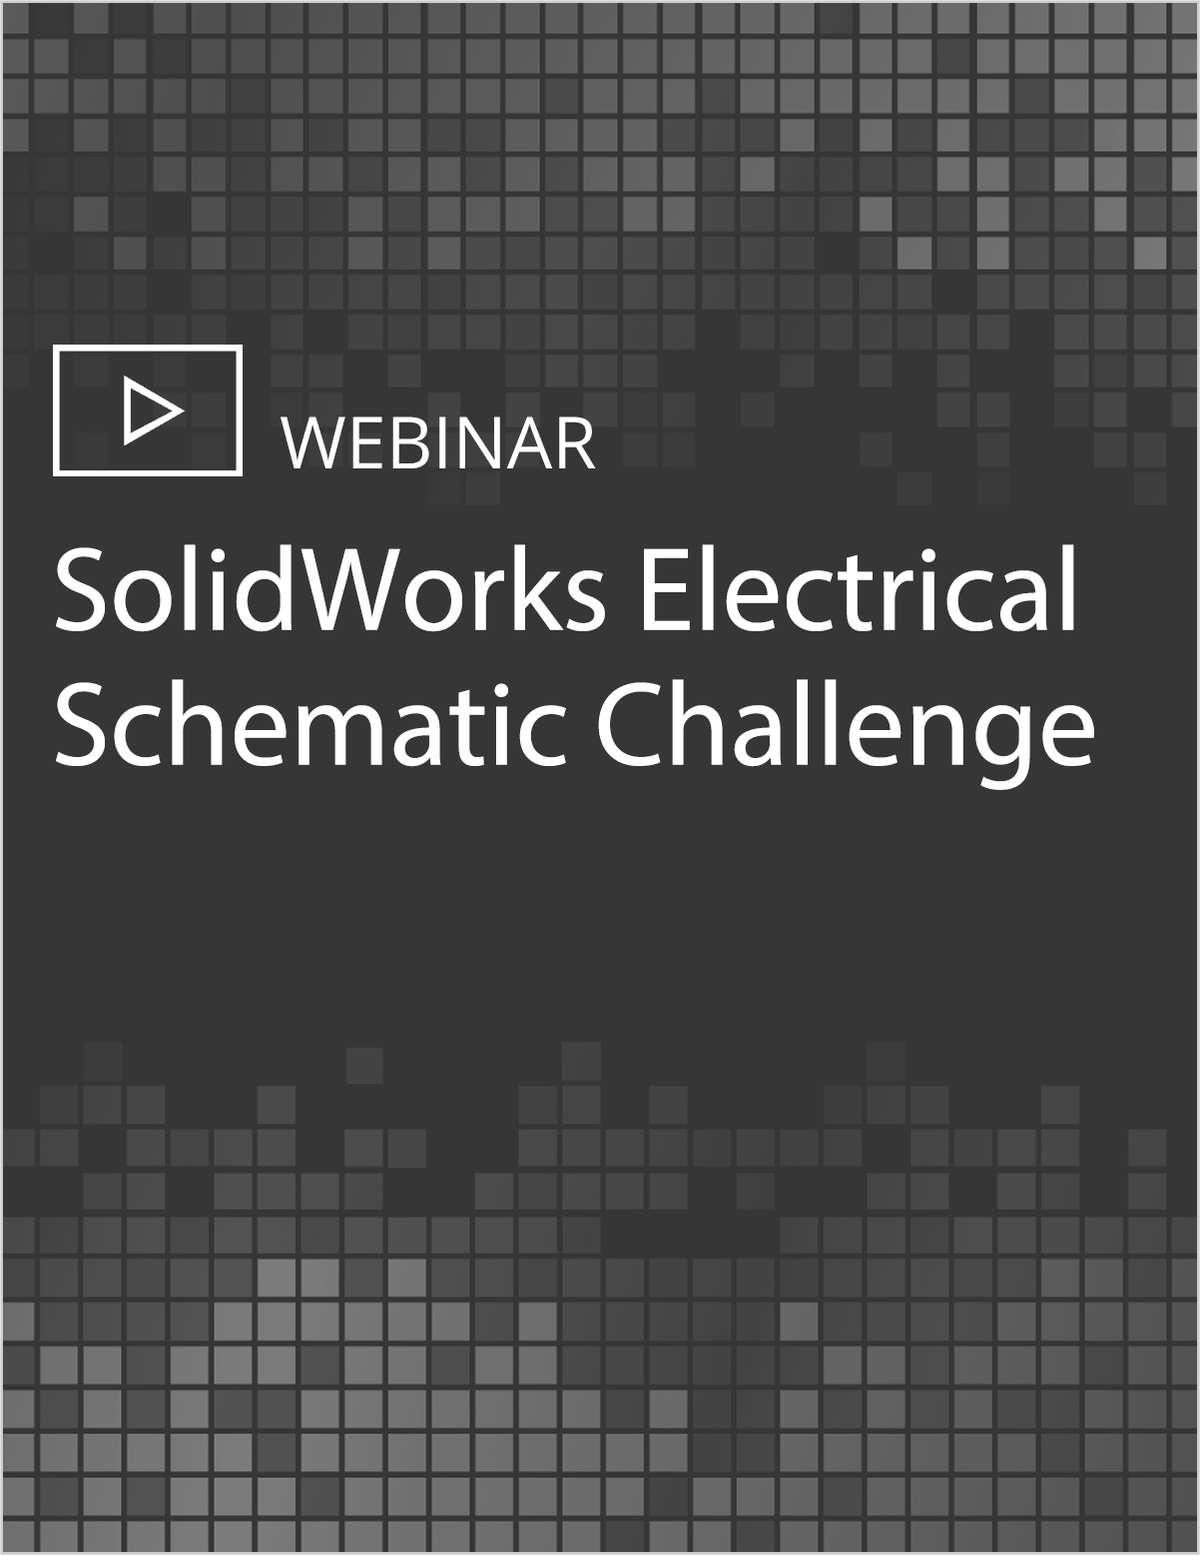 SolidWorks Electrical Schematic Challenge